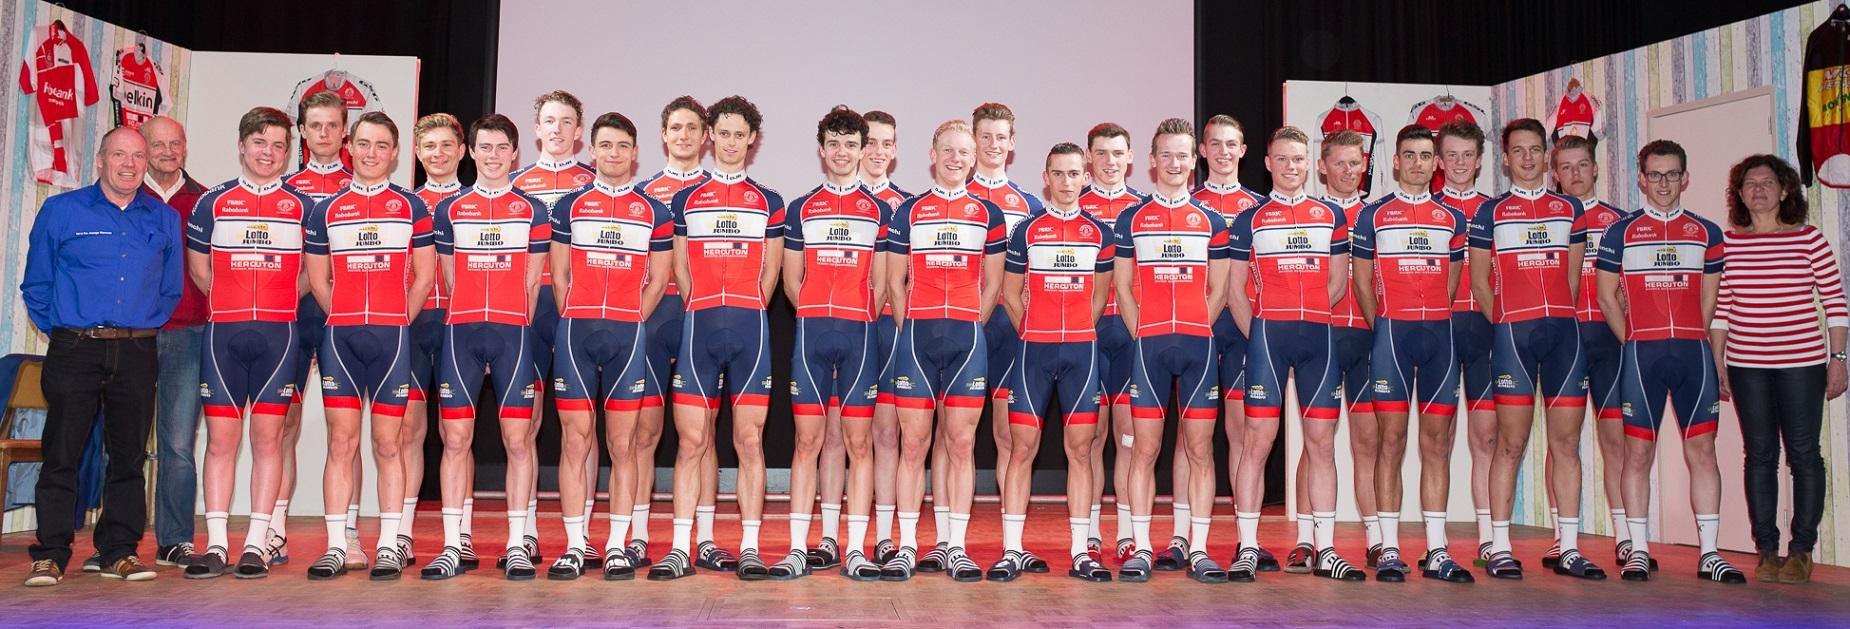 Team Lotto NL Jumbo De Jonge Renner 2017